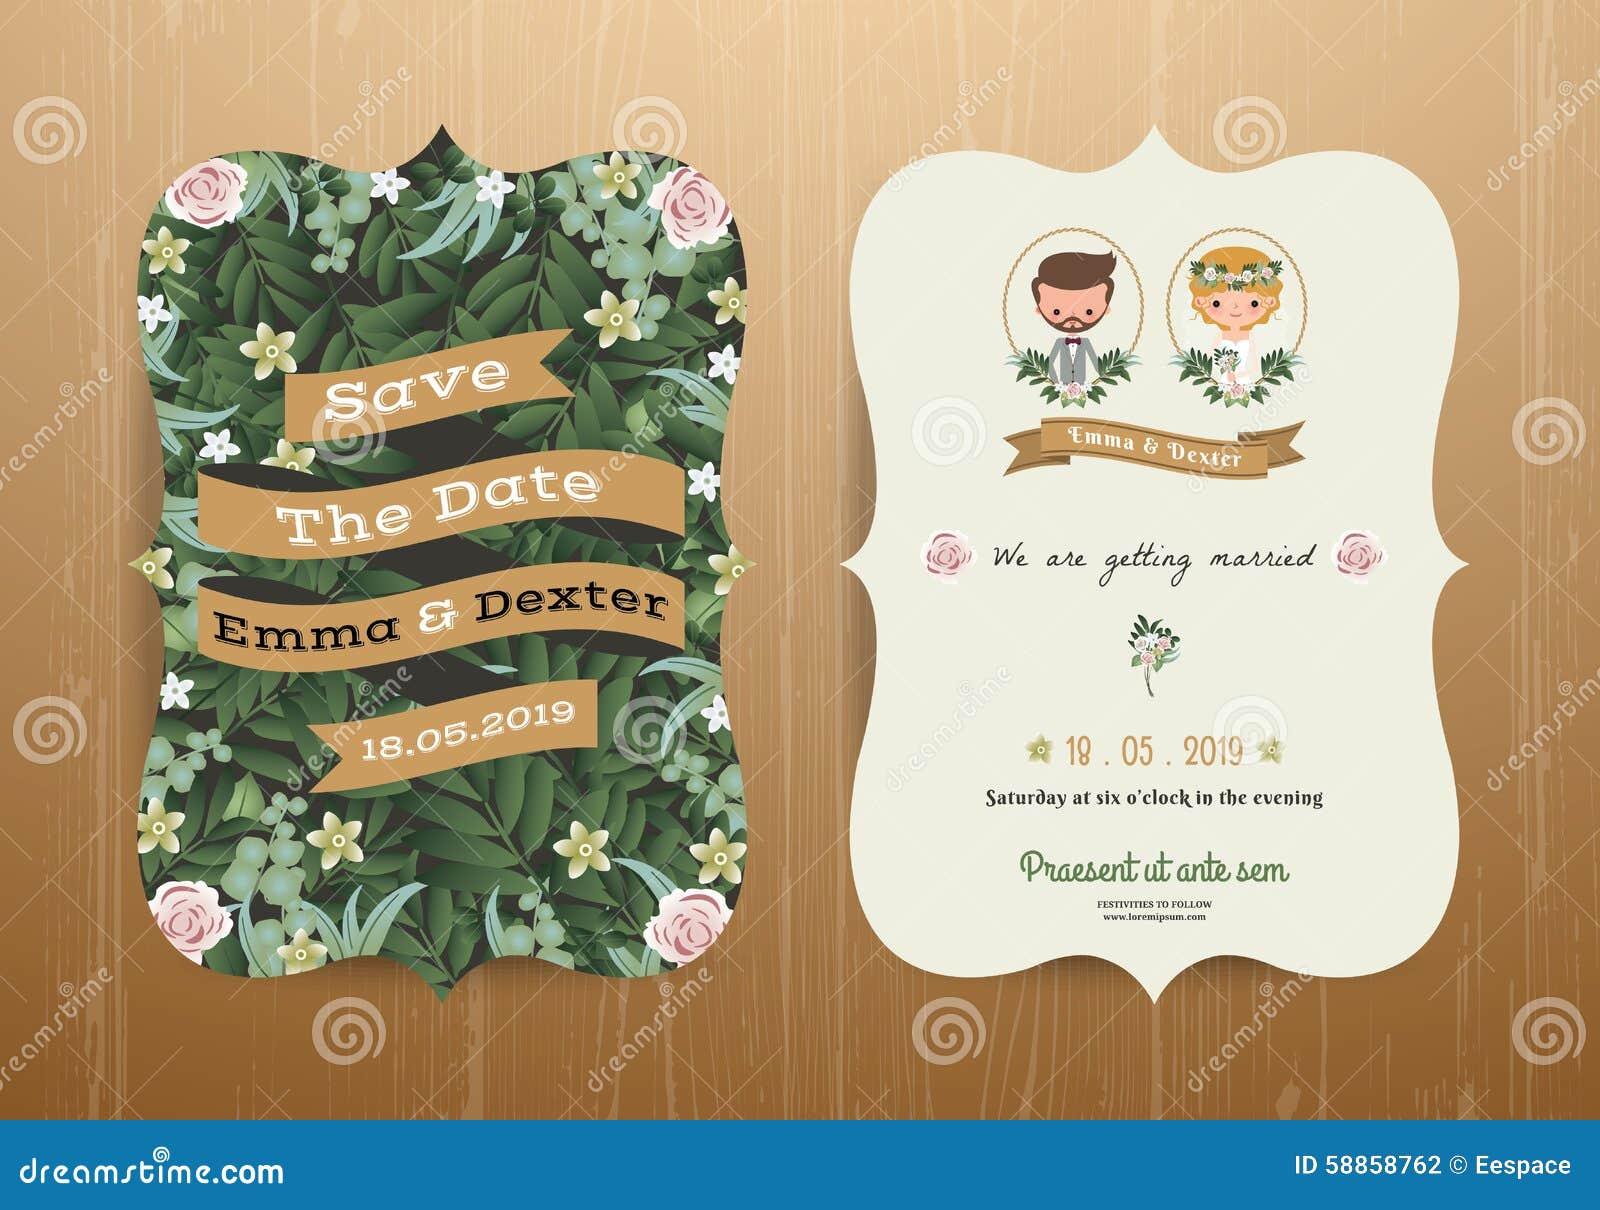 Wedding Invitation Card Rustic Cartoon Bride And Groom ...